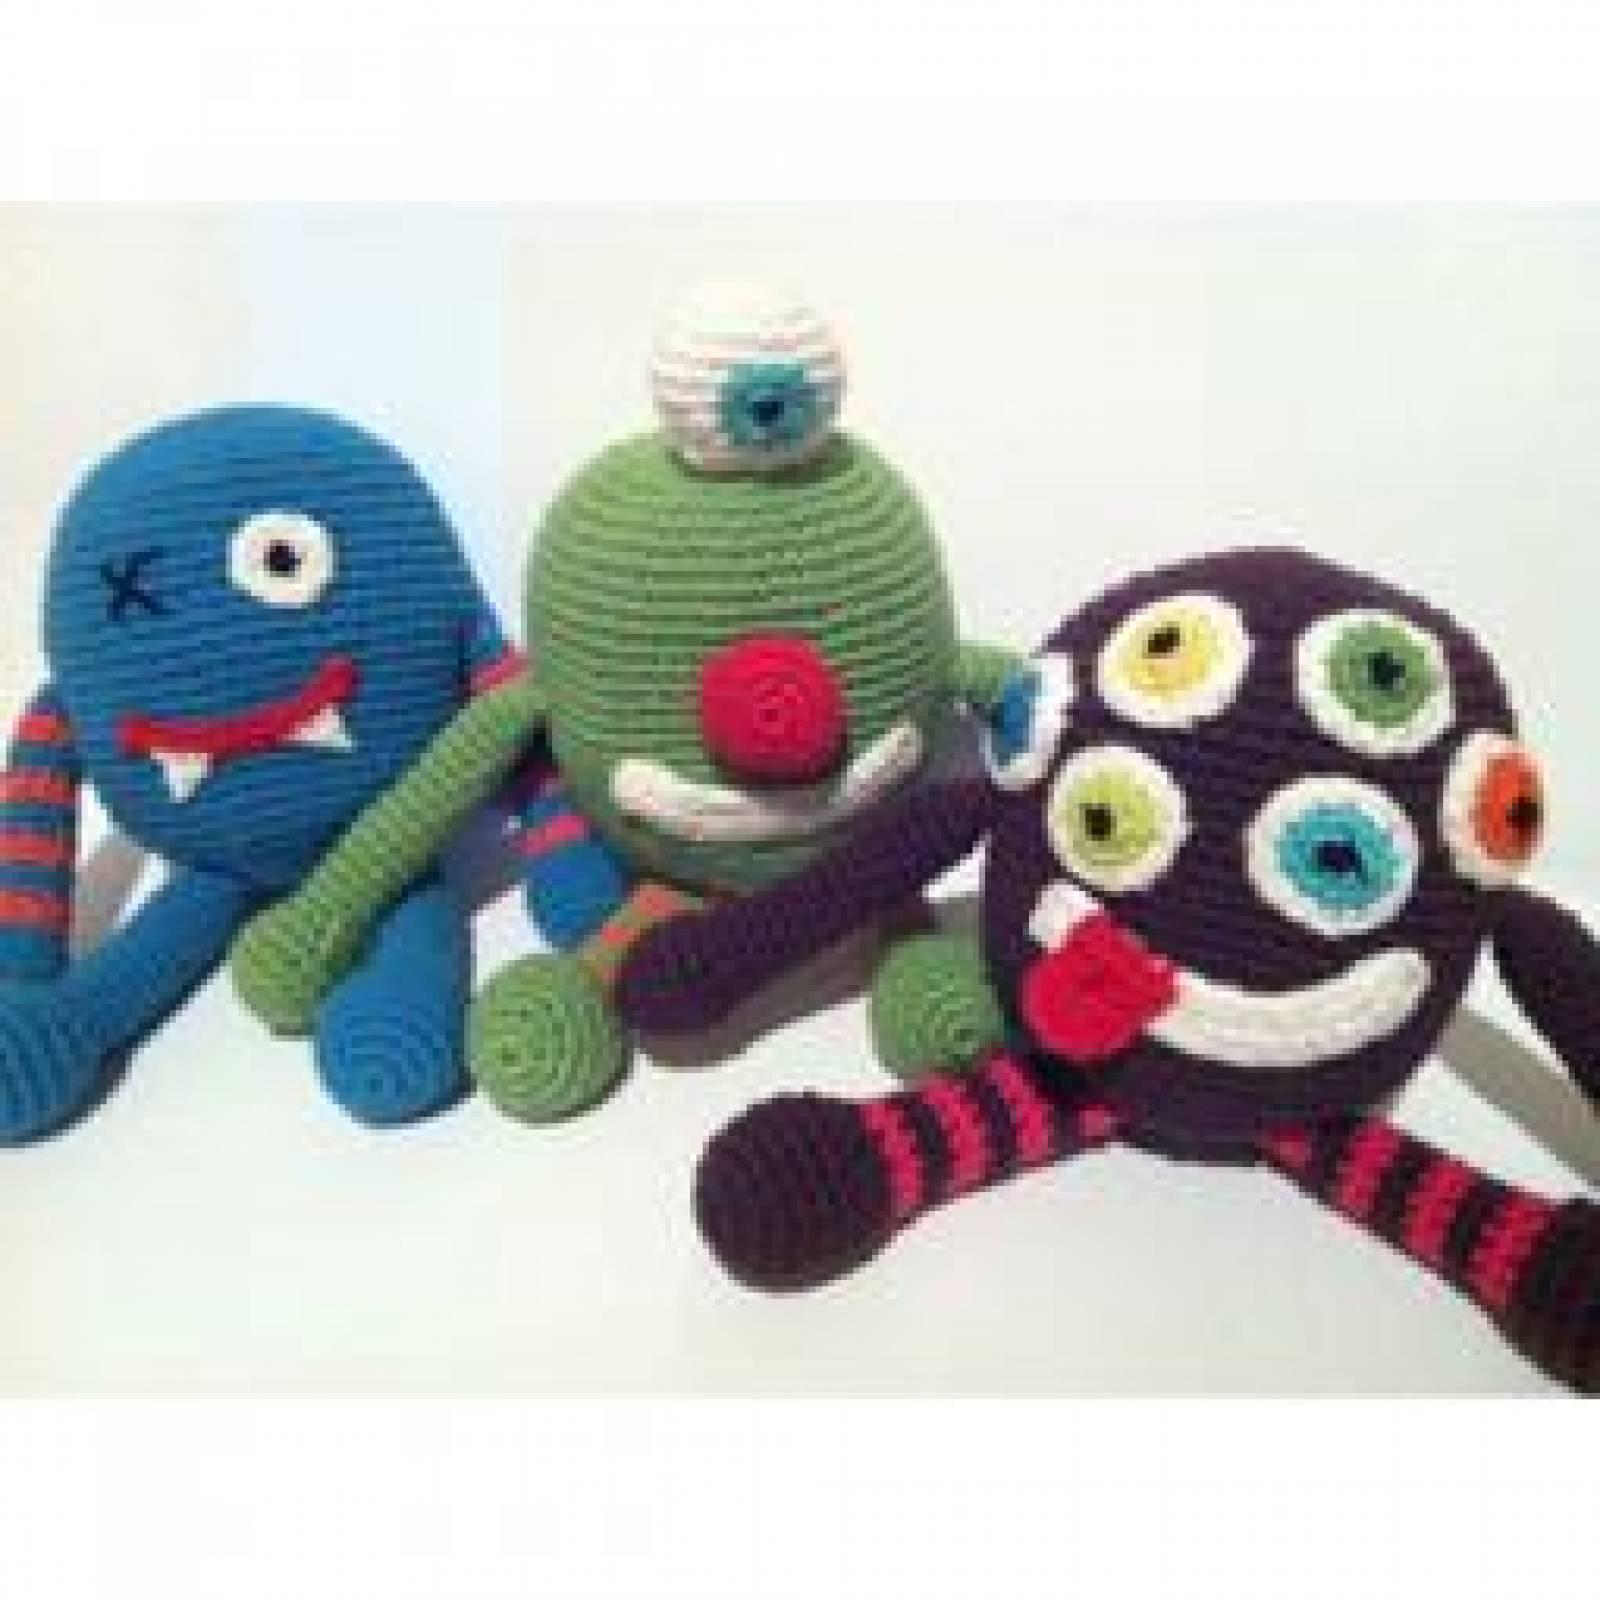 Purple Crochet Monster Handmade Soft Toy